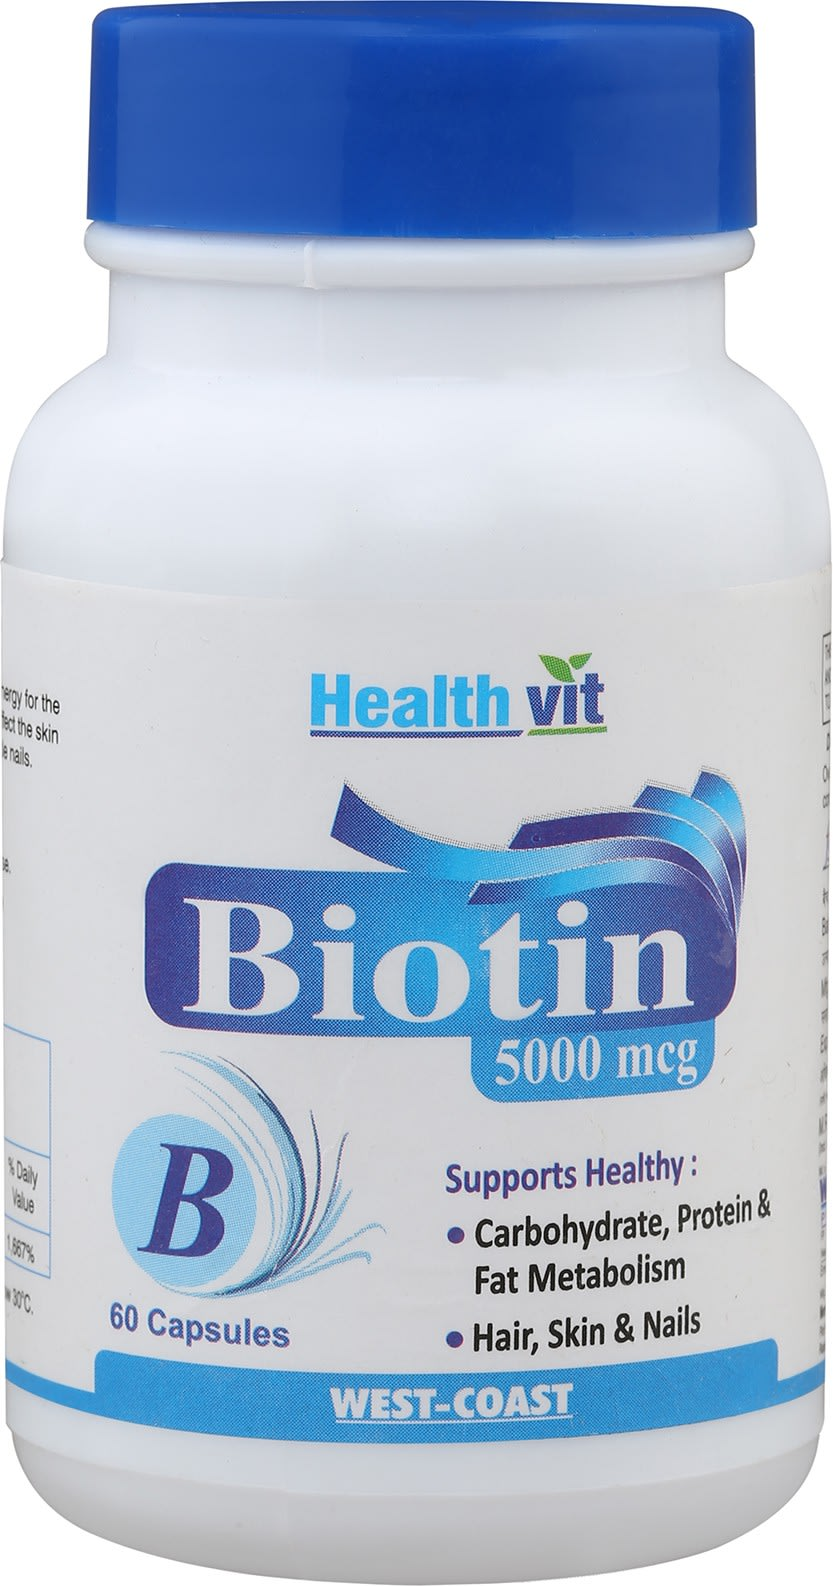 HealthVit Biotin 5000mcg Capsule